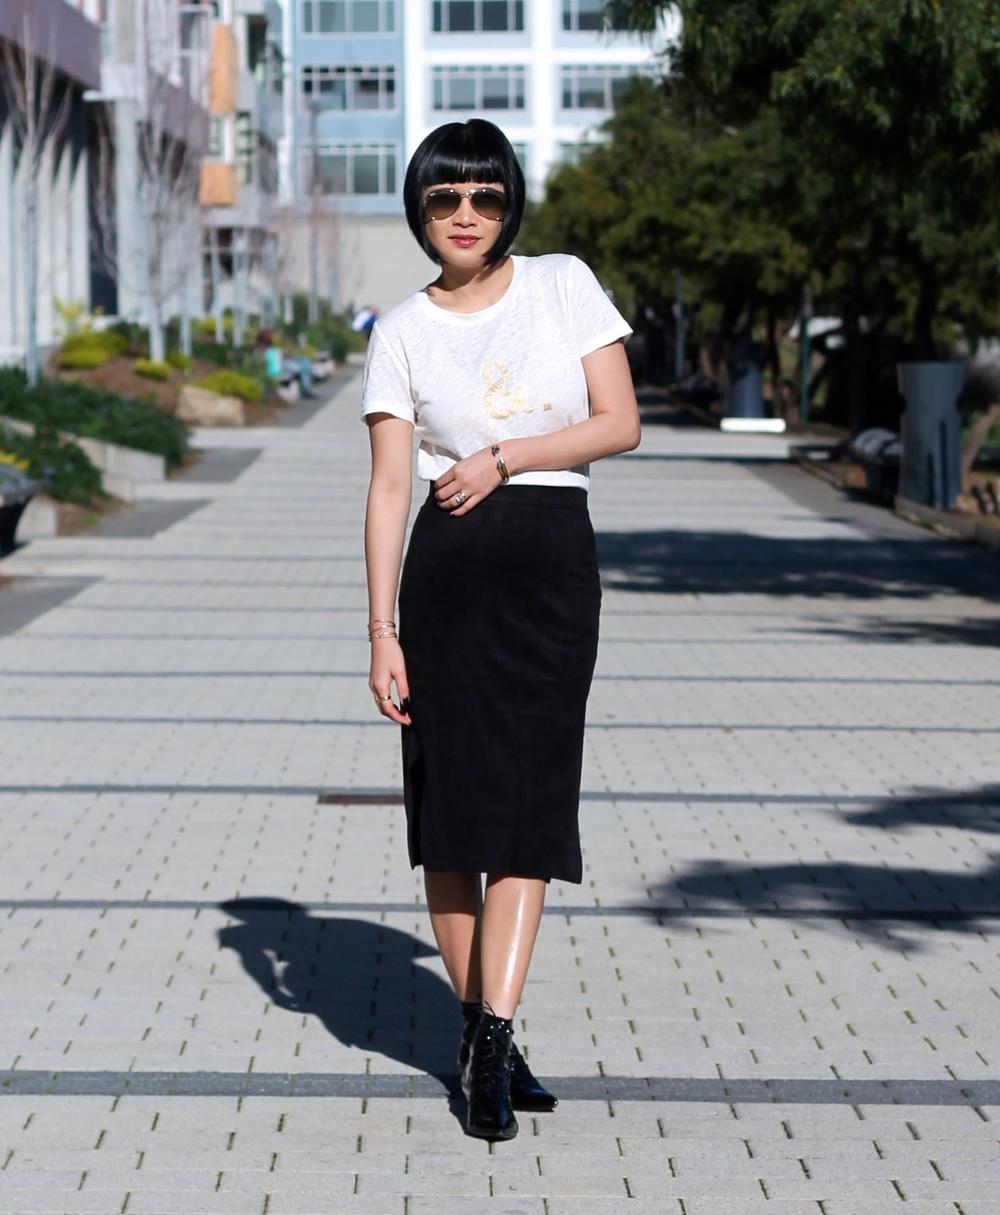 Madewell tshirt, Aritzia skirt, Saint Laurent booties, Ray-Ban sunglasses